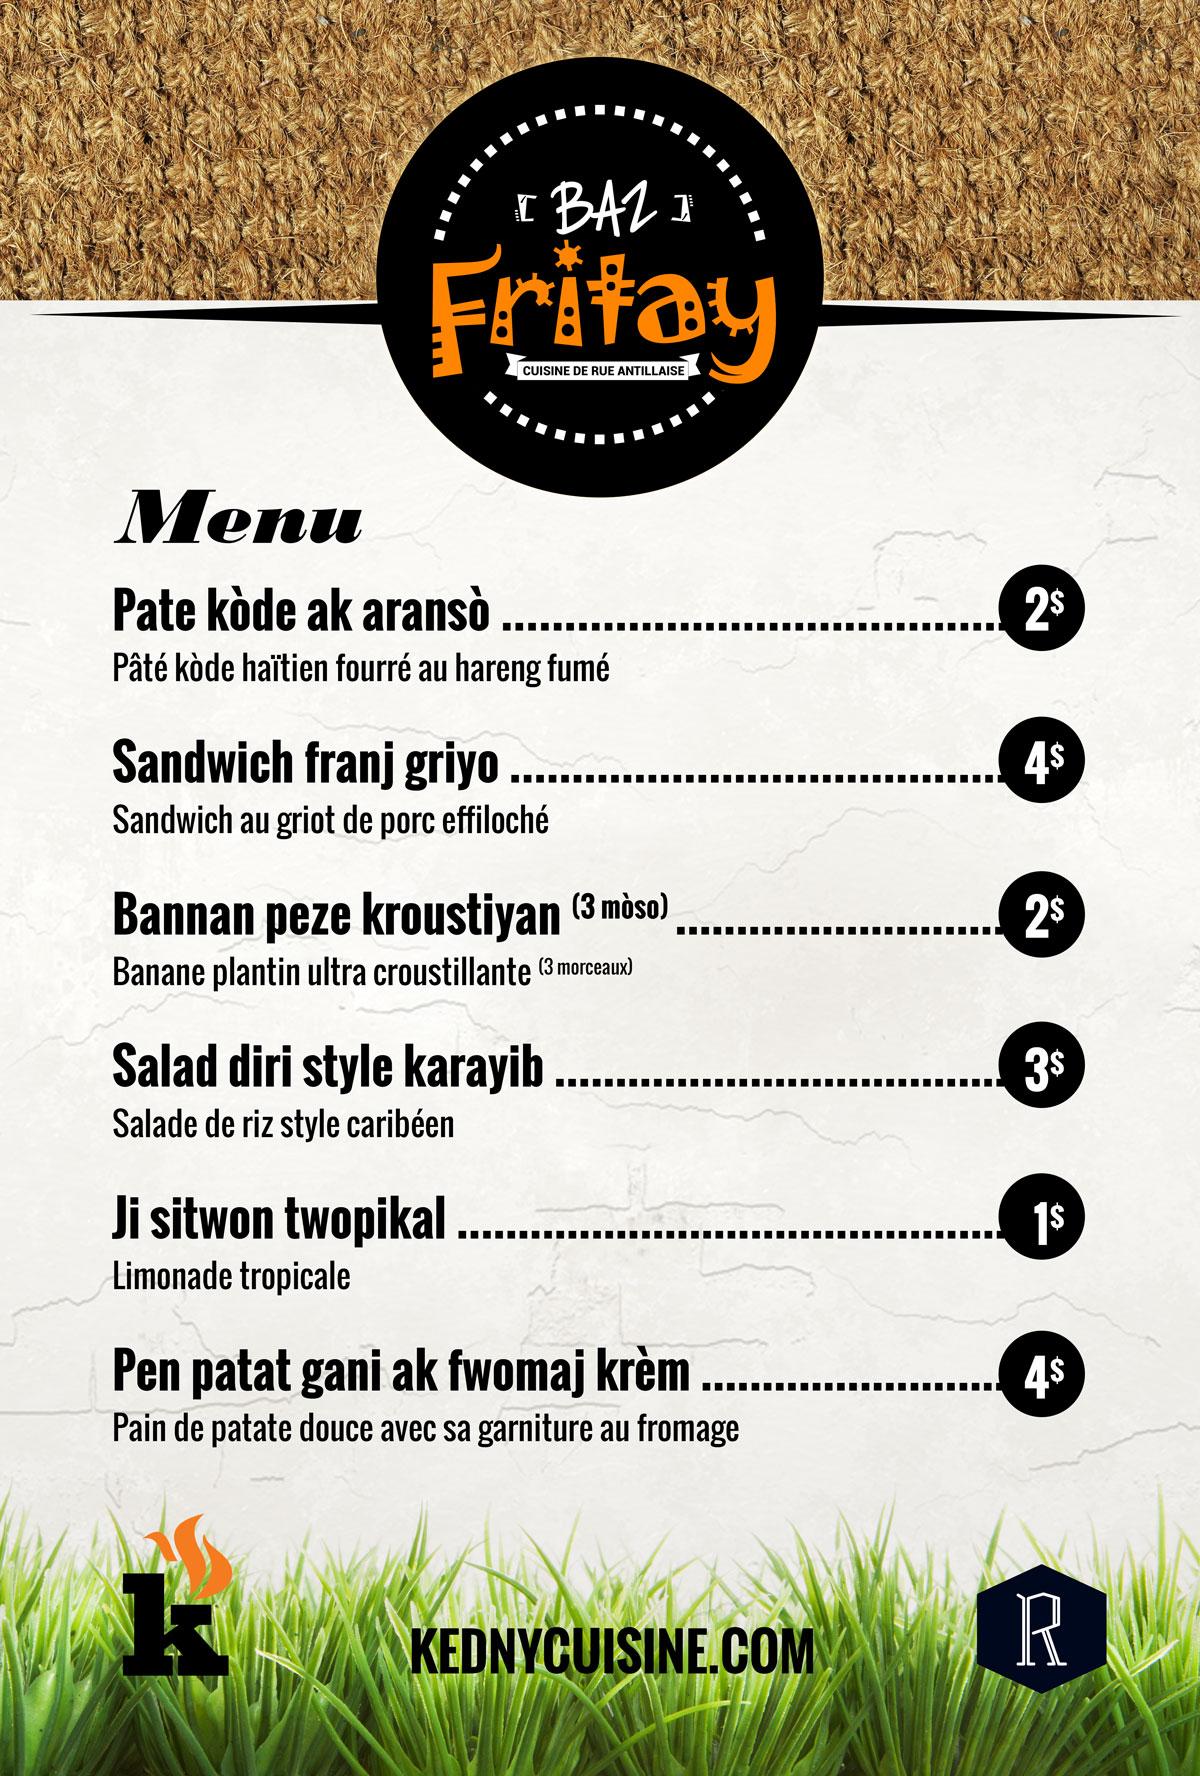 Baz Fritay - Cuisine de rue antillaise - MENU